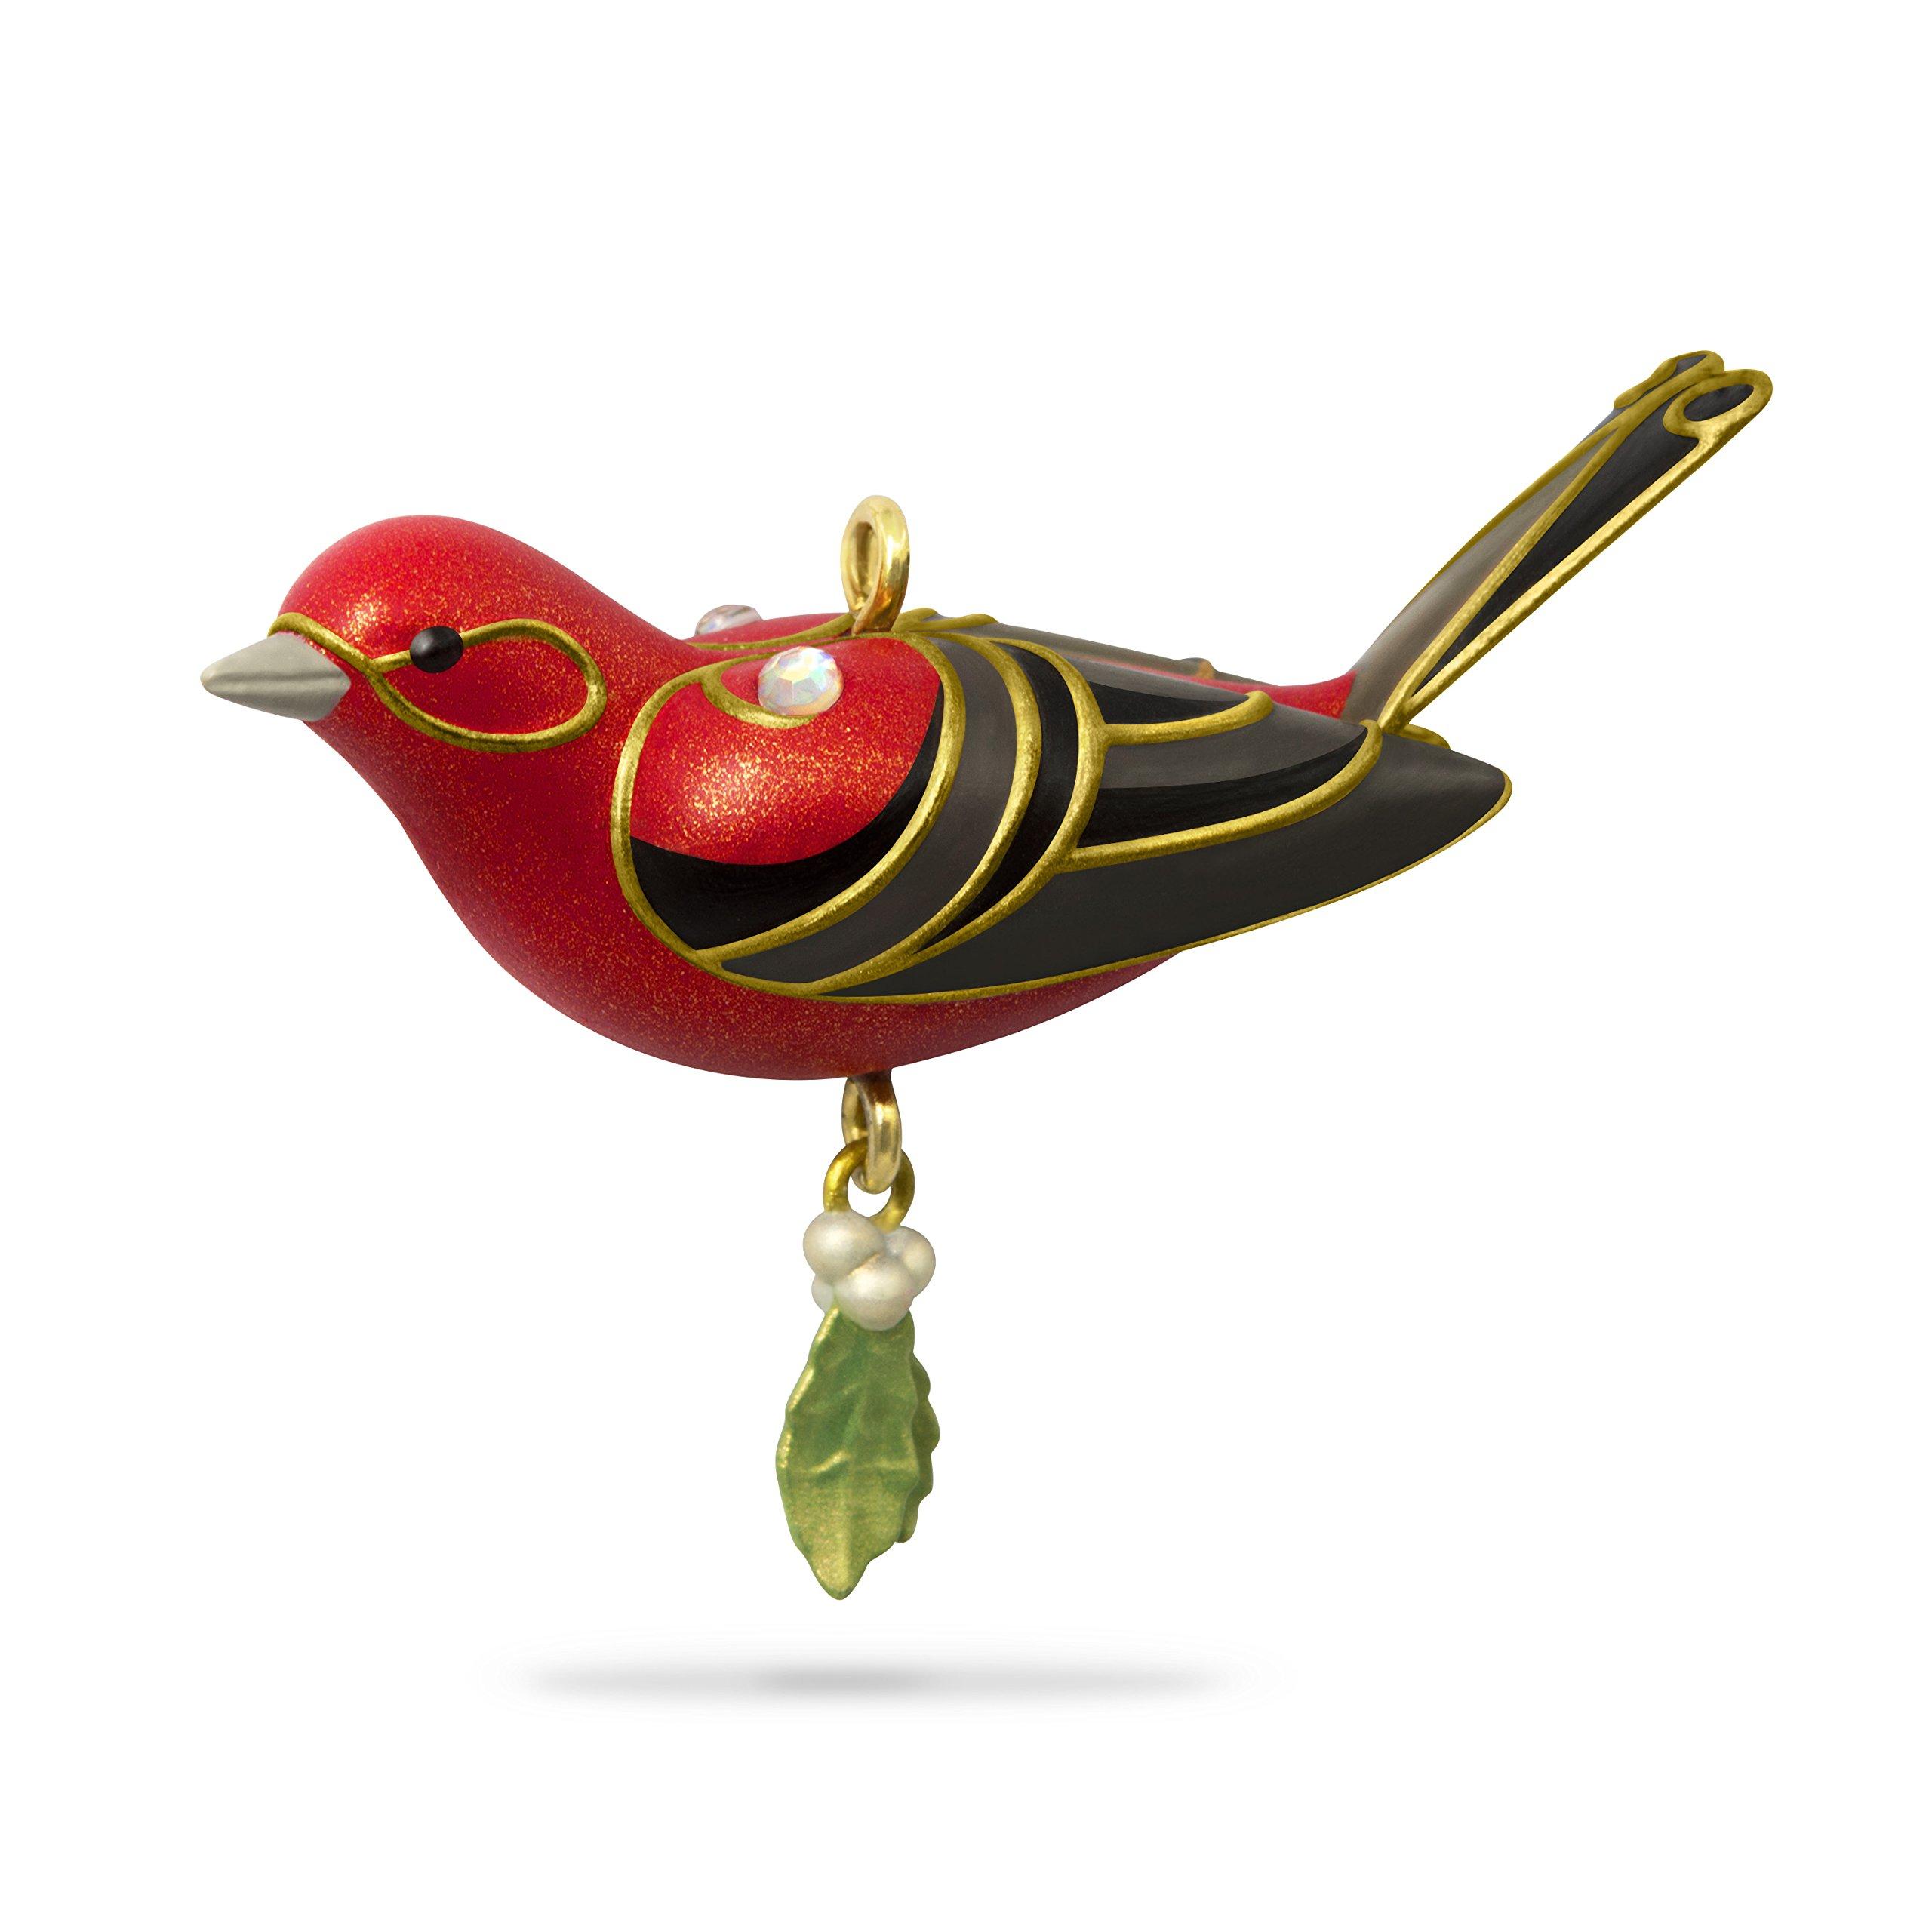 Hallmark Keepsake Christmas Ornament 2018 Year Dated: Hallmark 2018 Red Tanager Bird Miniature Ornament